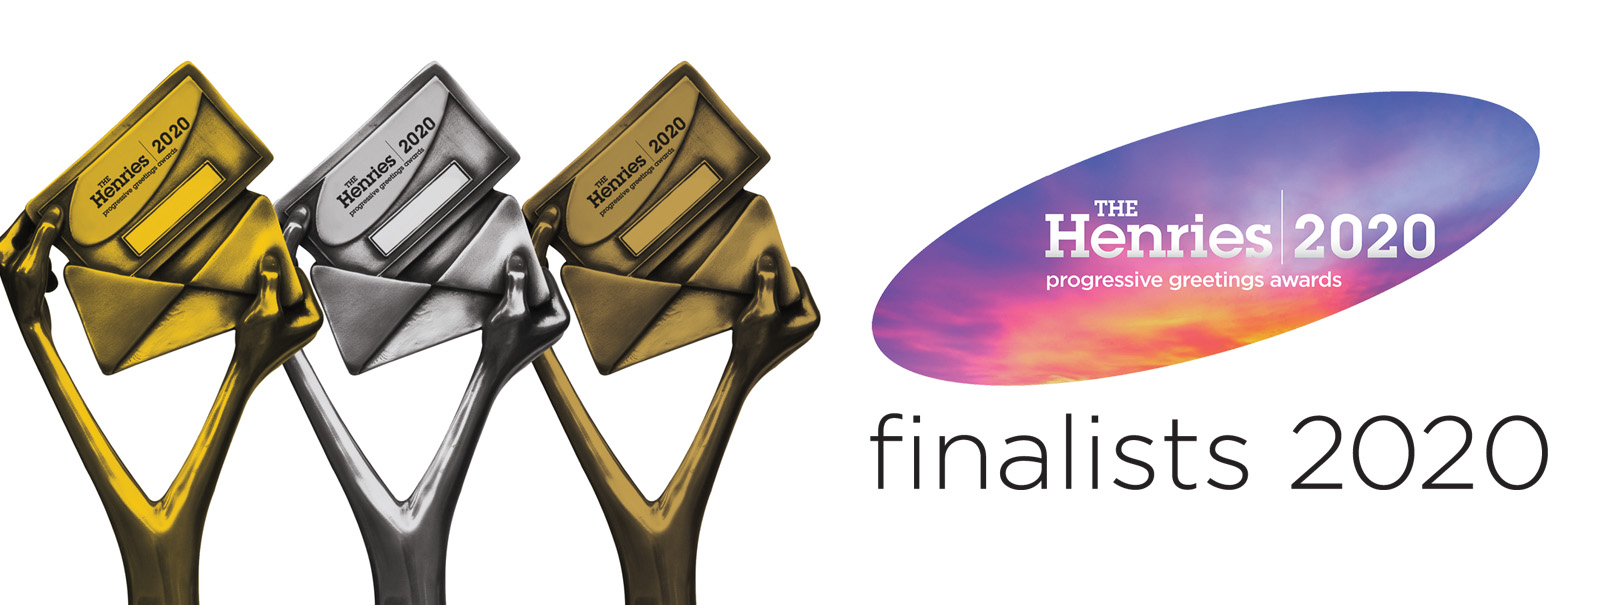 2B. Henries Finalists header copy 2